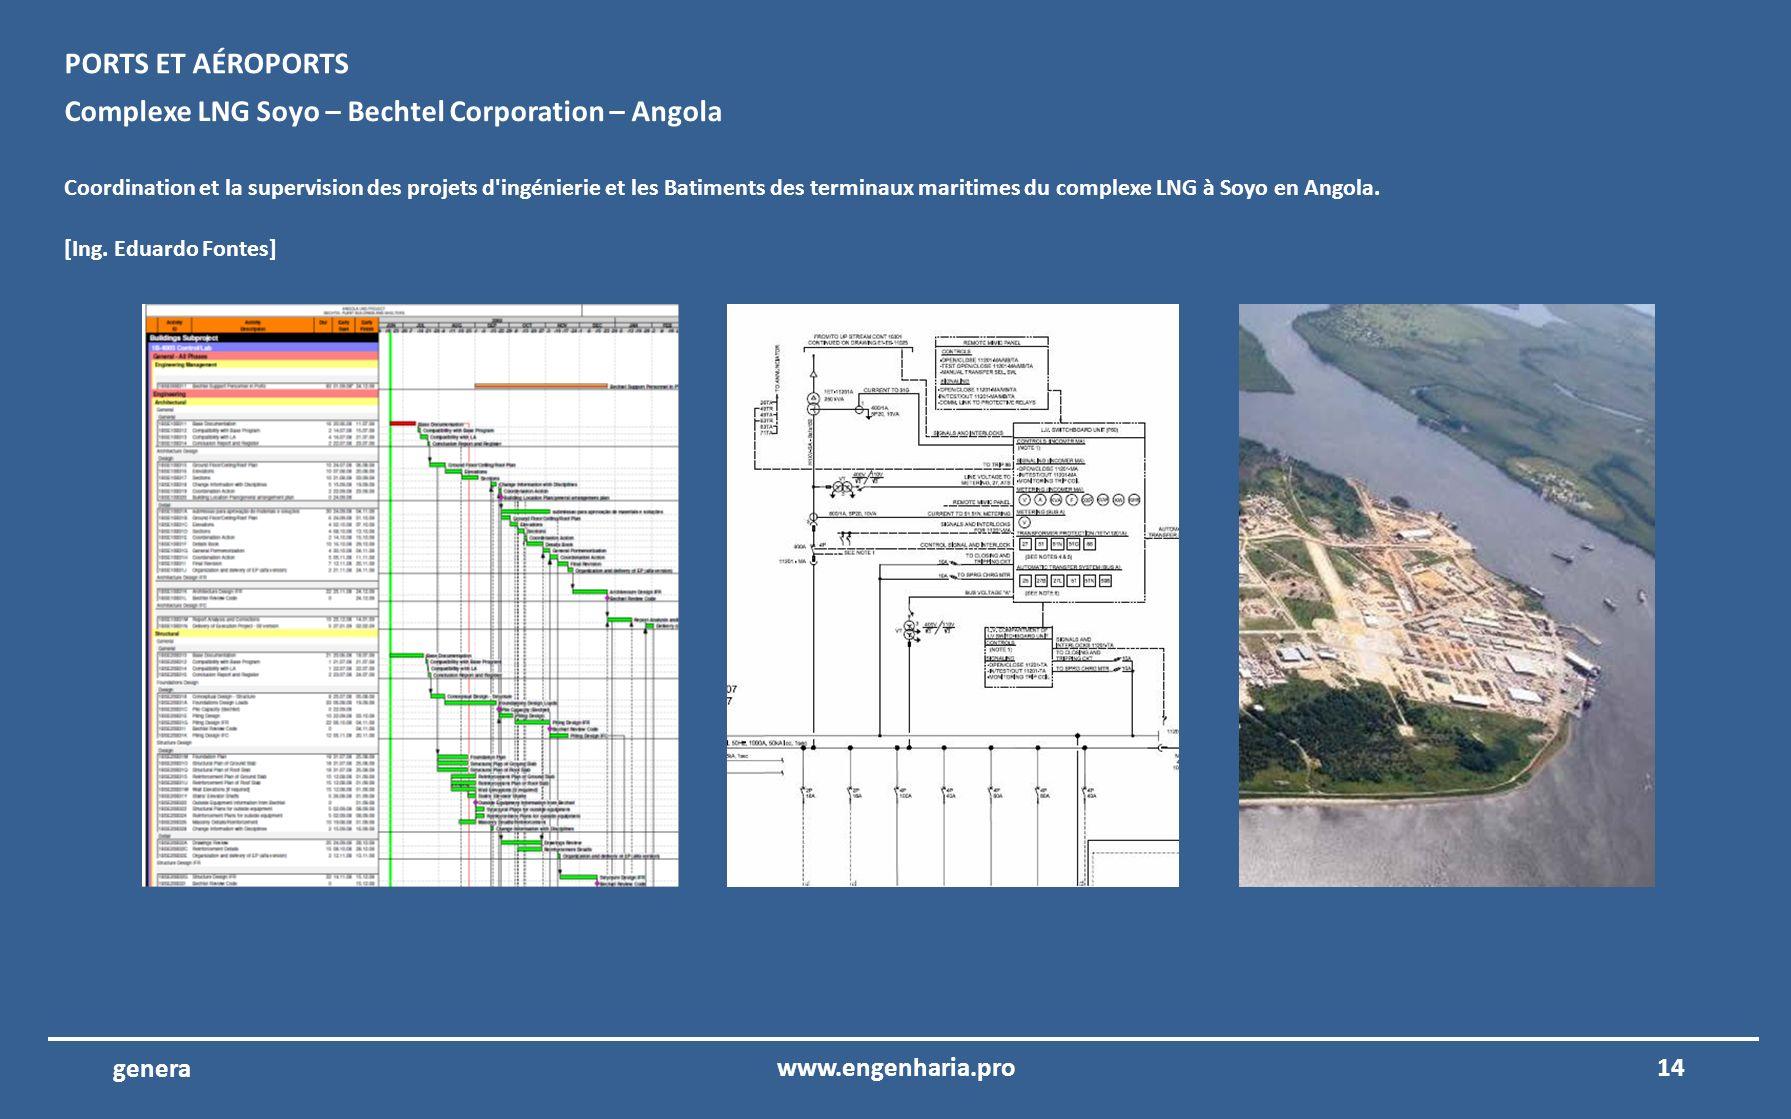 Complexe LNG Soyo – Bechtel Corporation – Angola